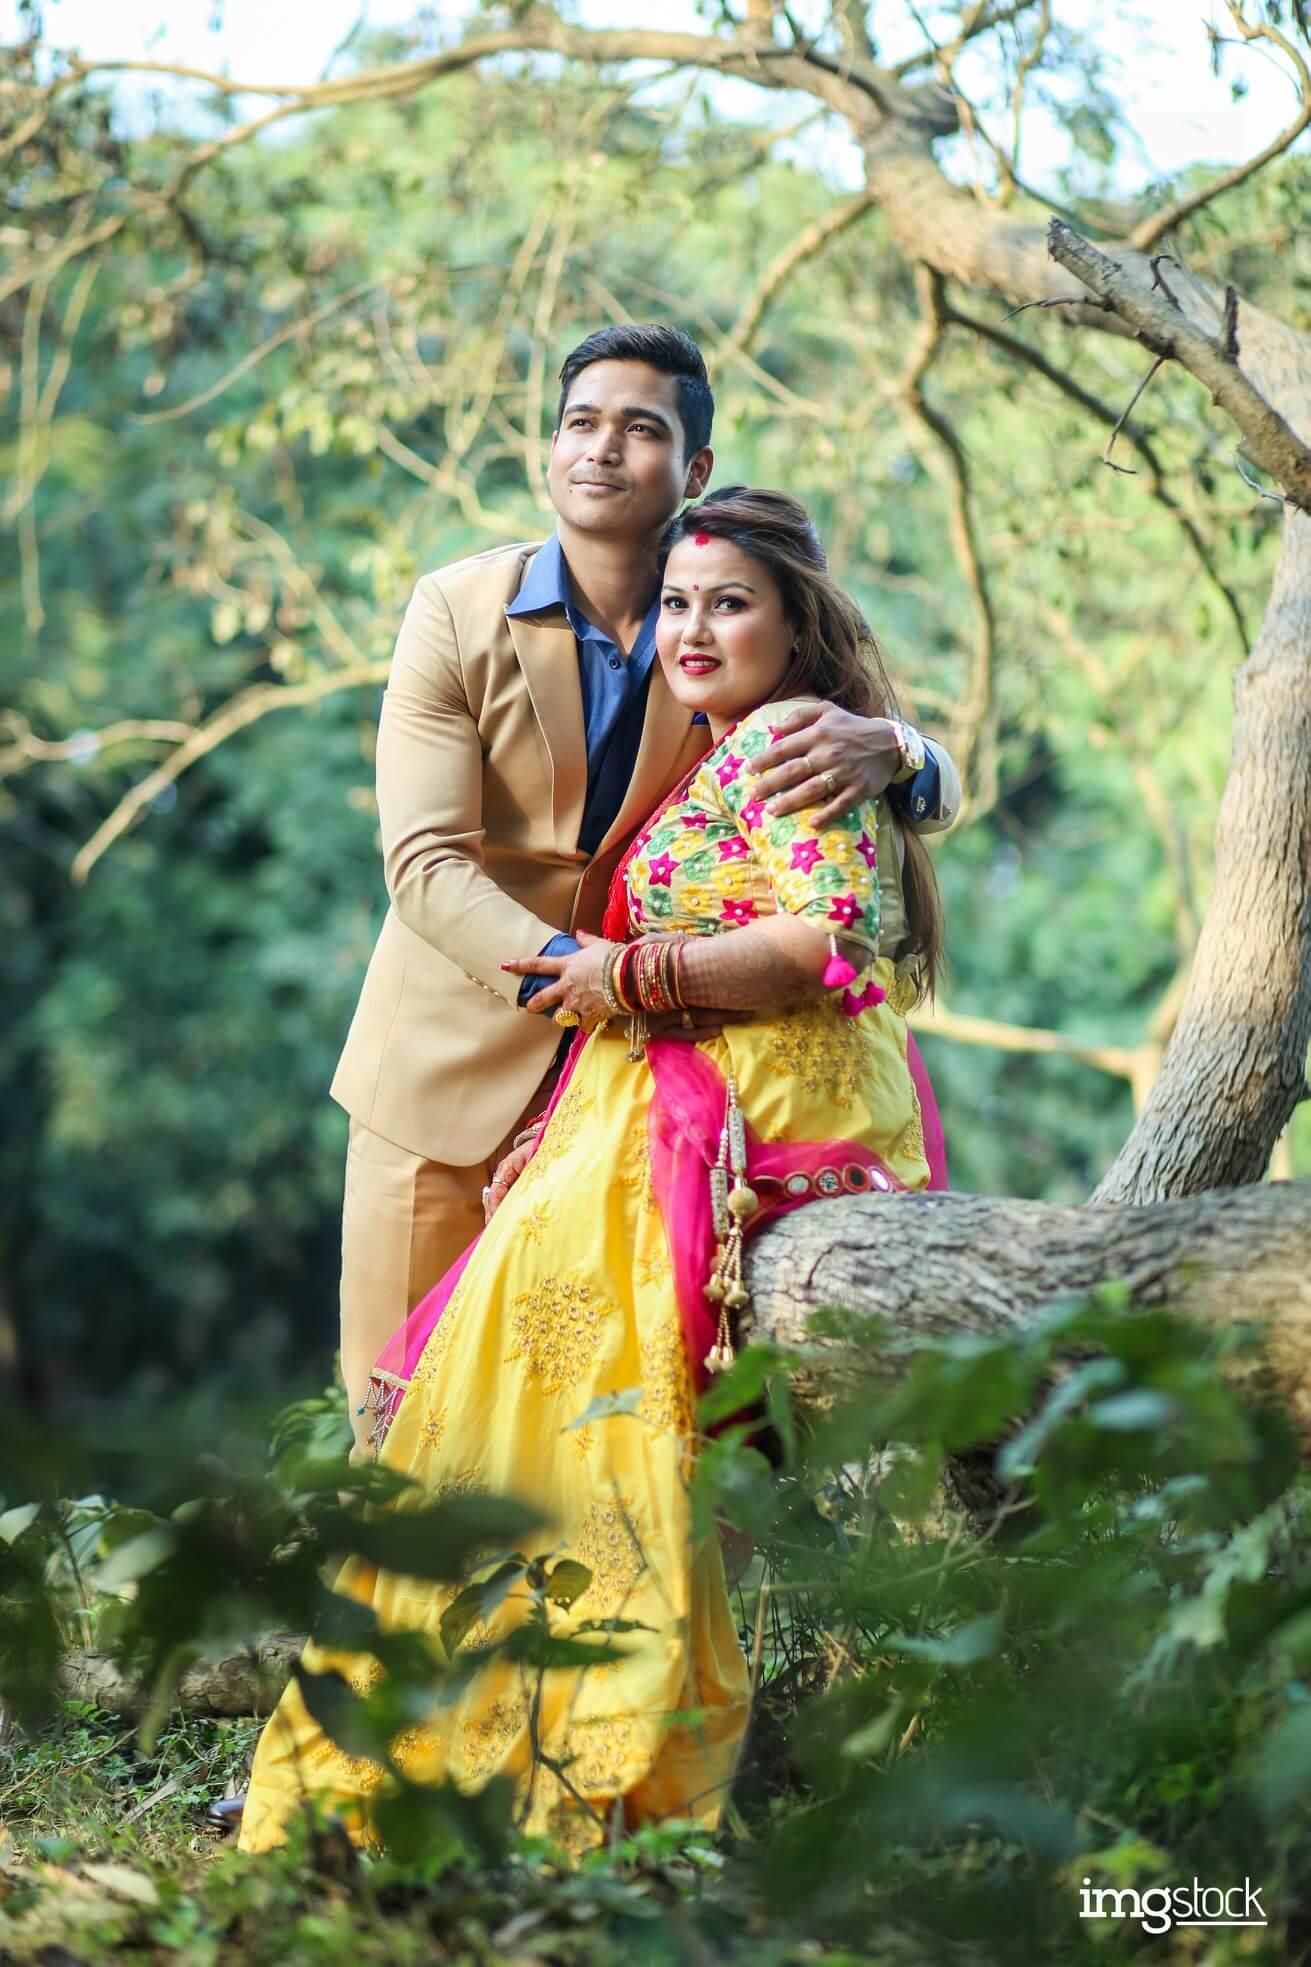 Bivor Starc Amatya - Wedding Photography, ImgStock Biratnagar